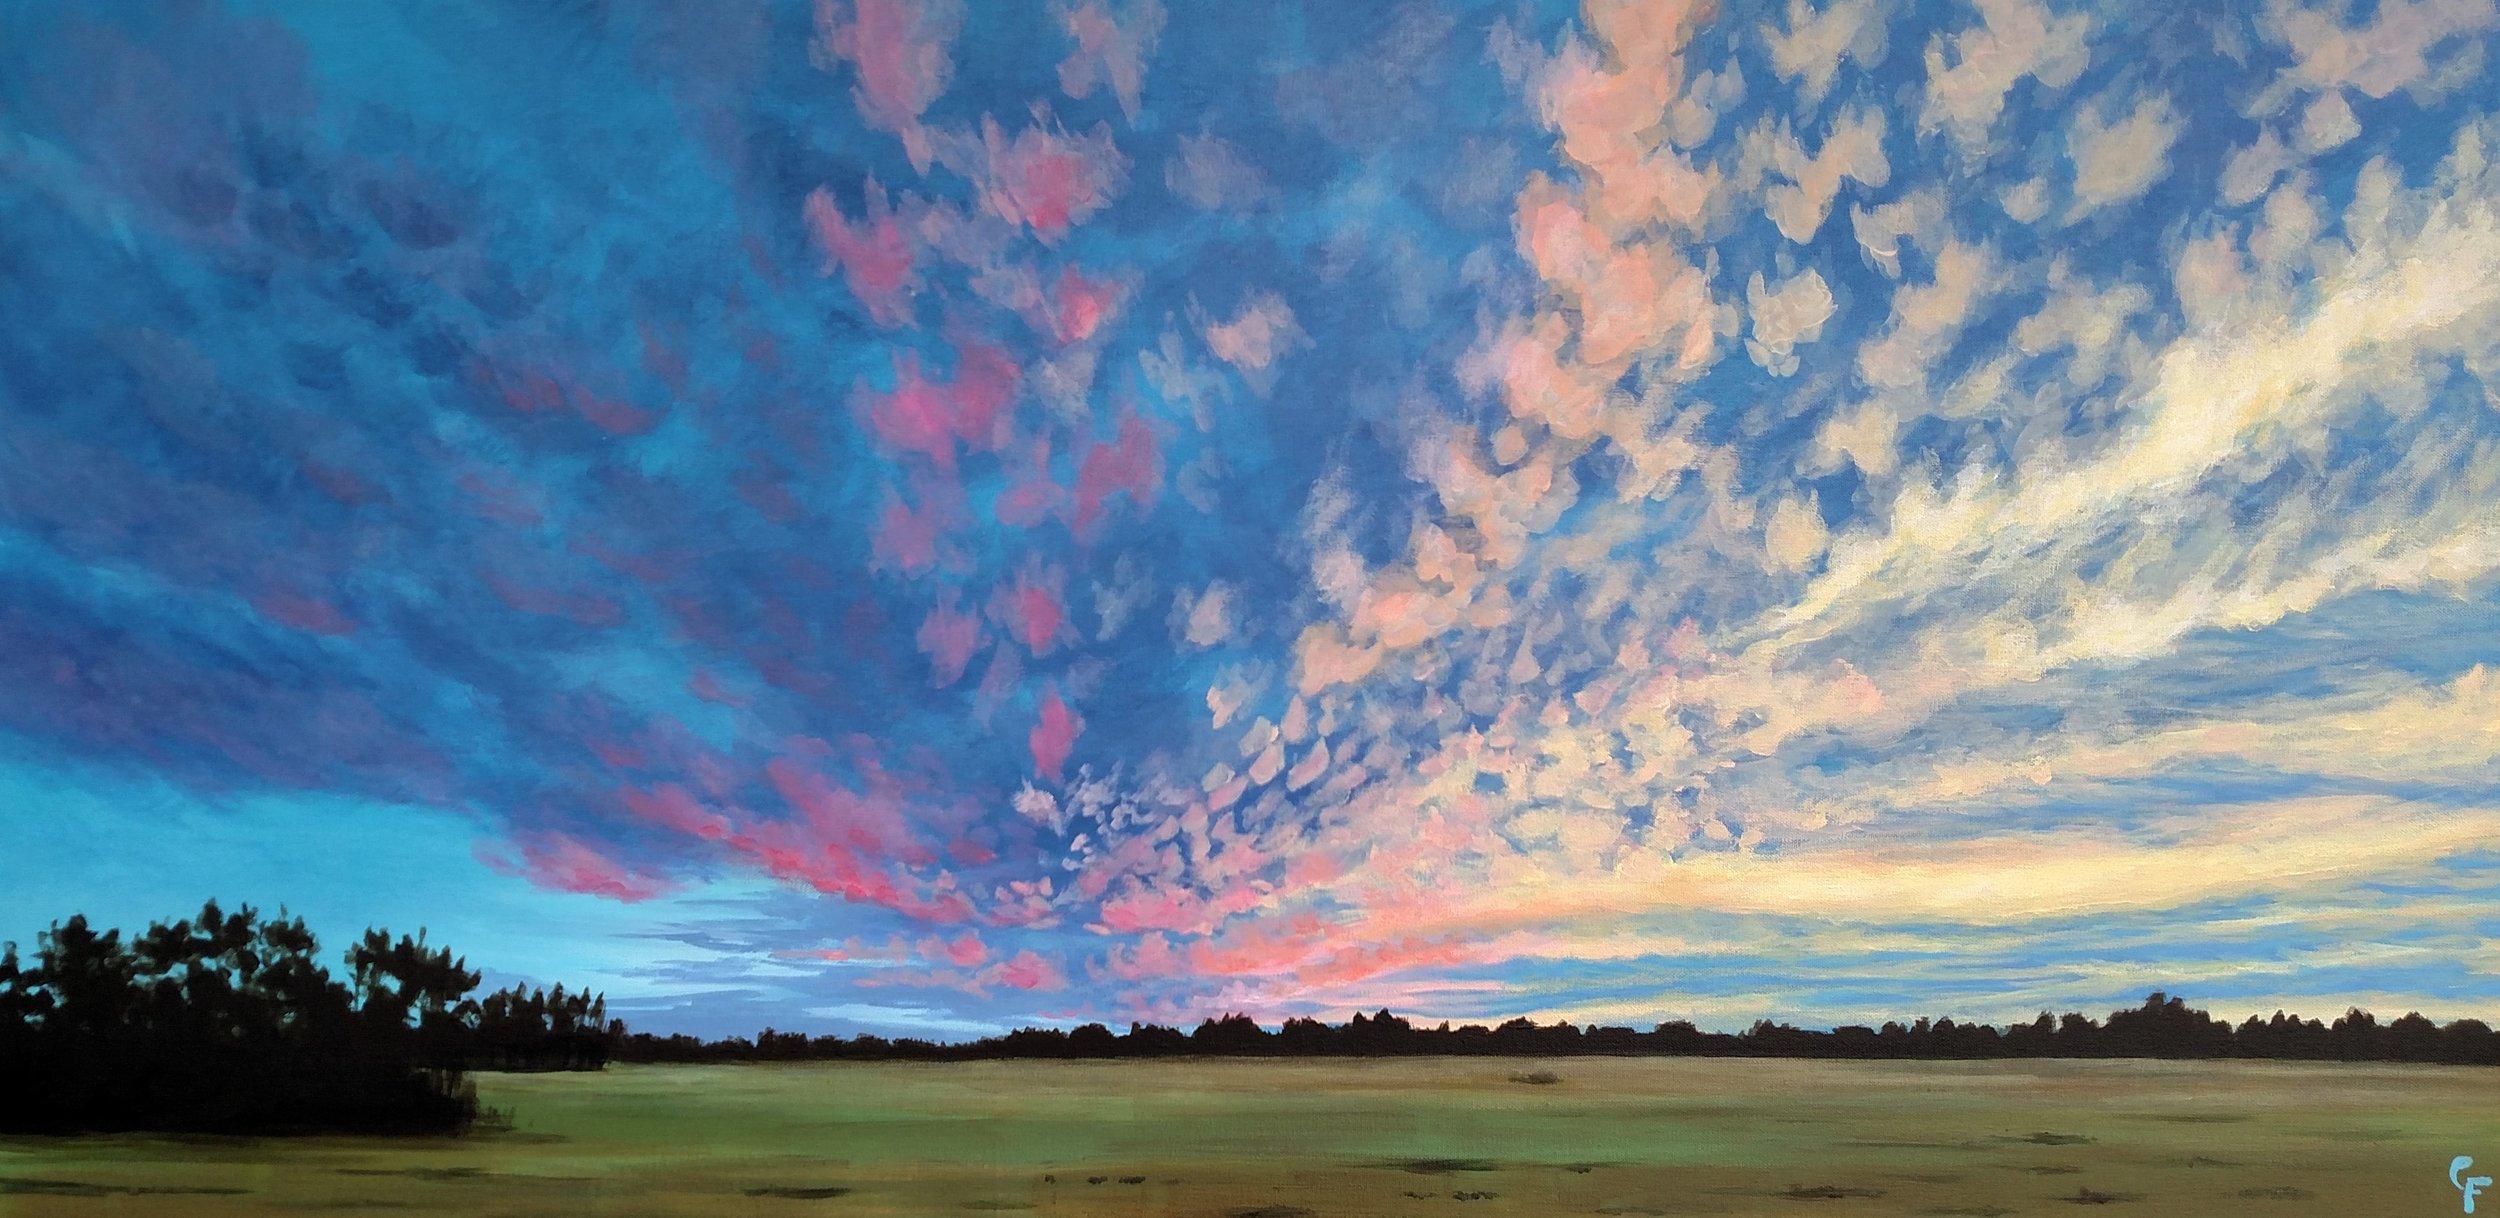 """November Confetti Sky"" by Catherine Freshley"